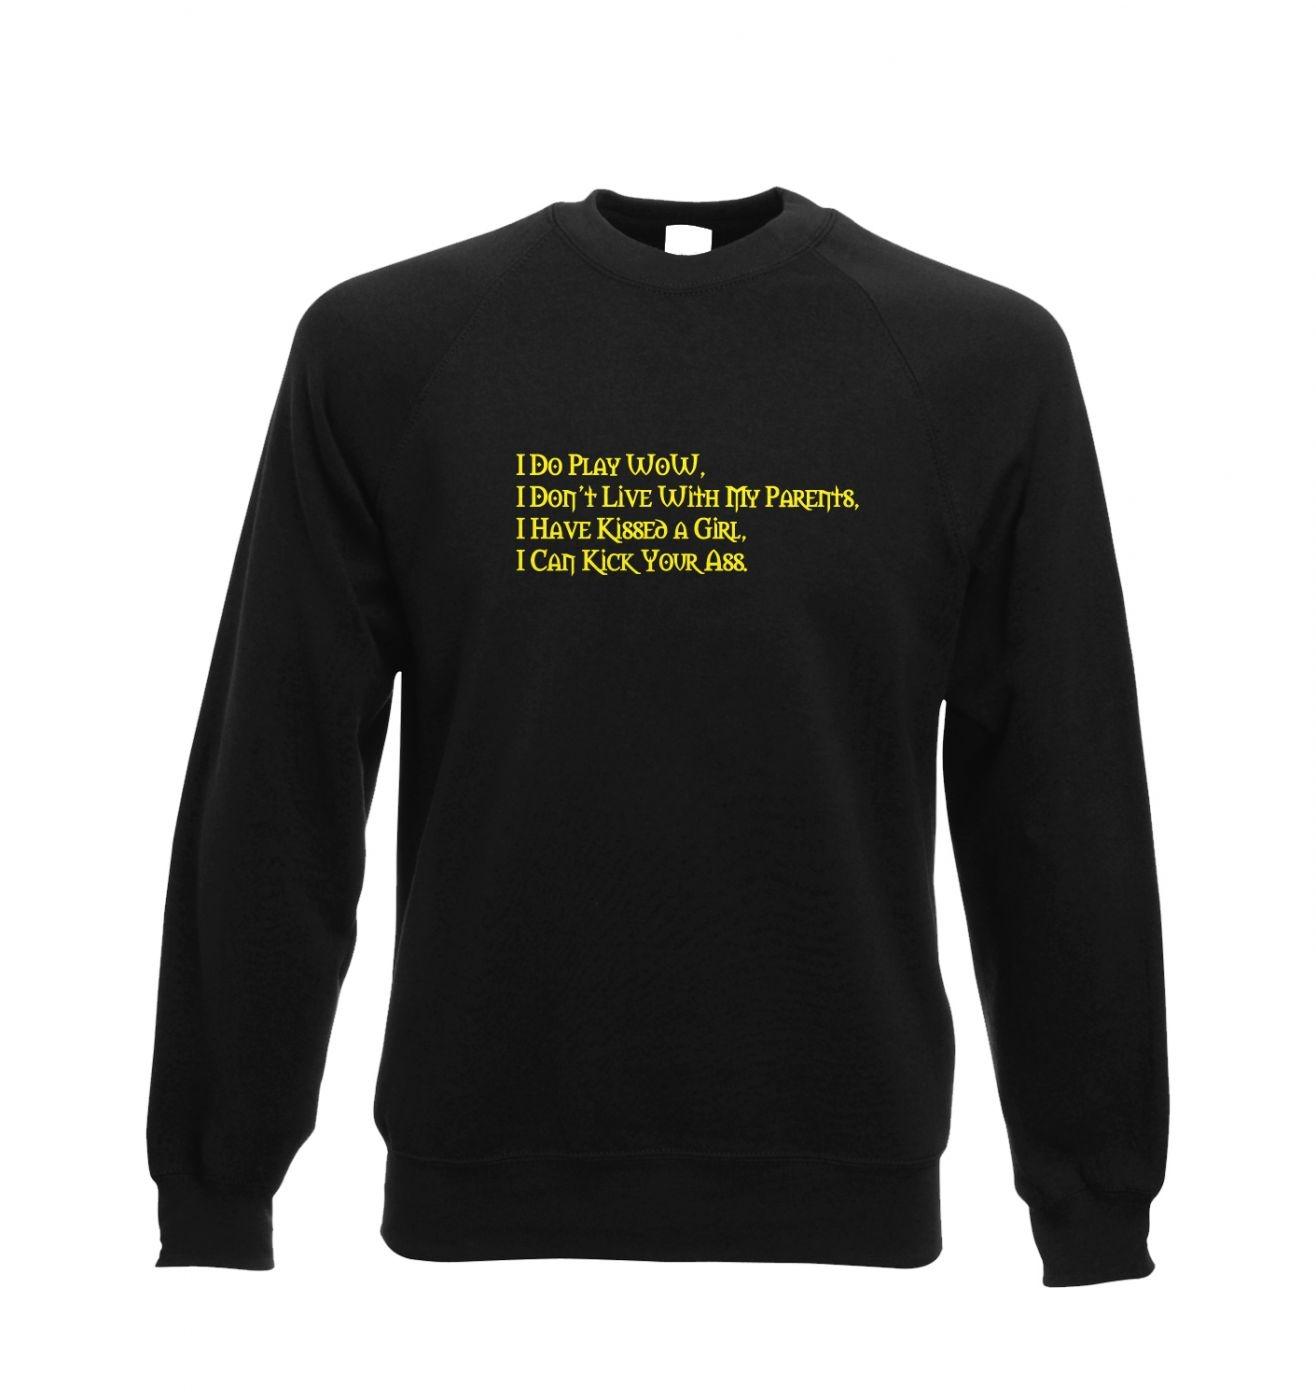 I Do Play WoW crewneck sweatshirt